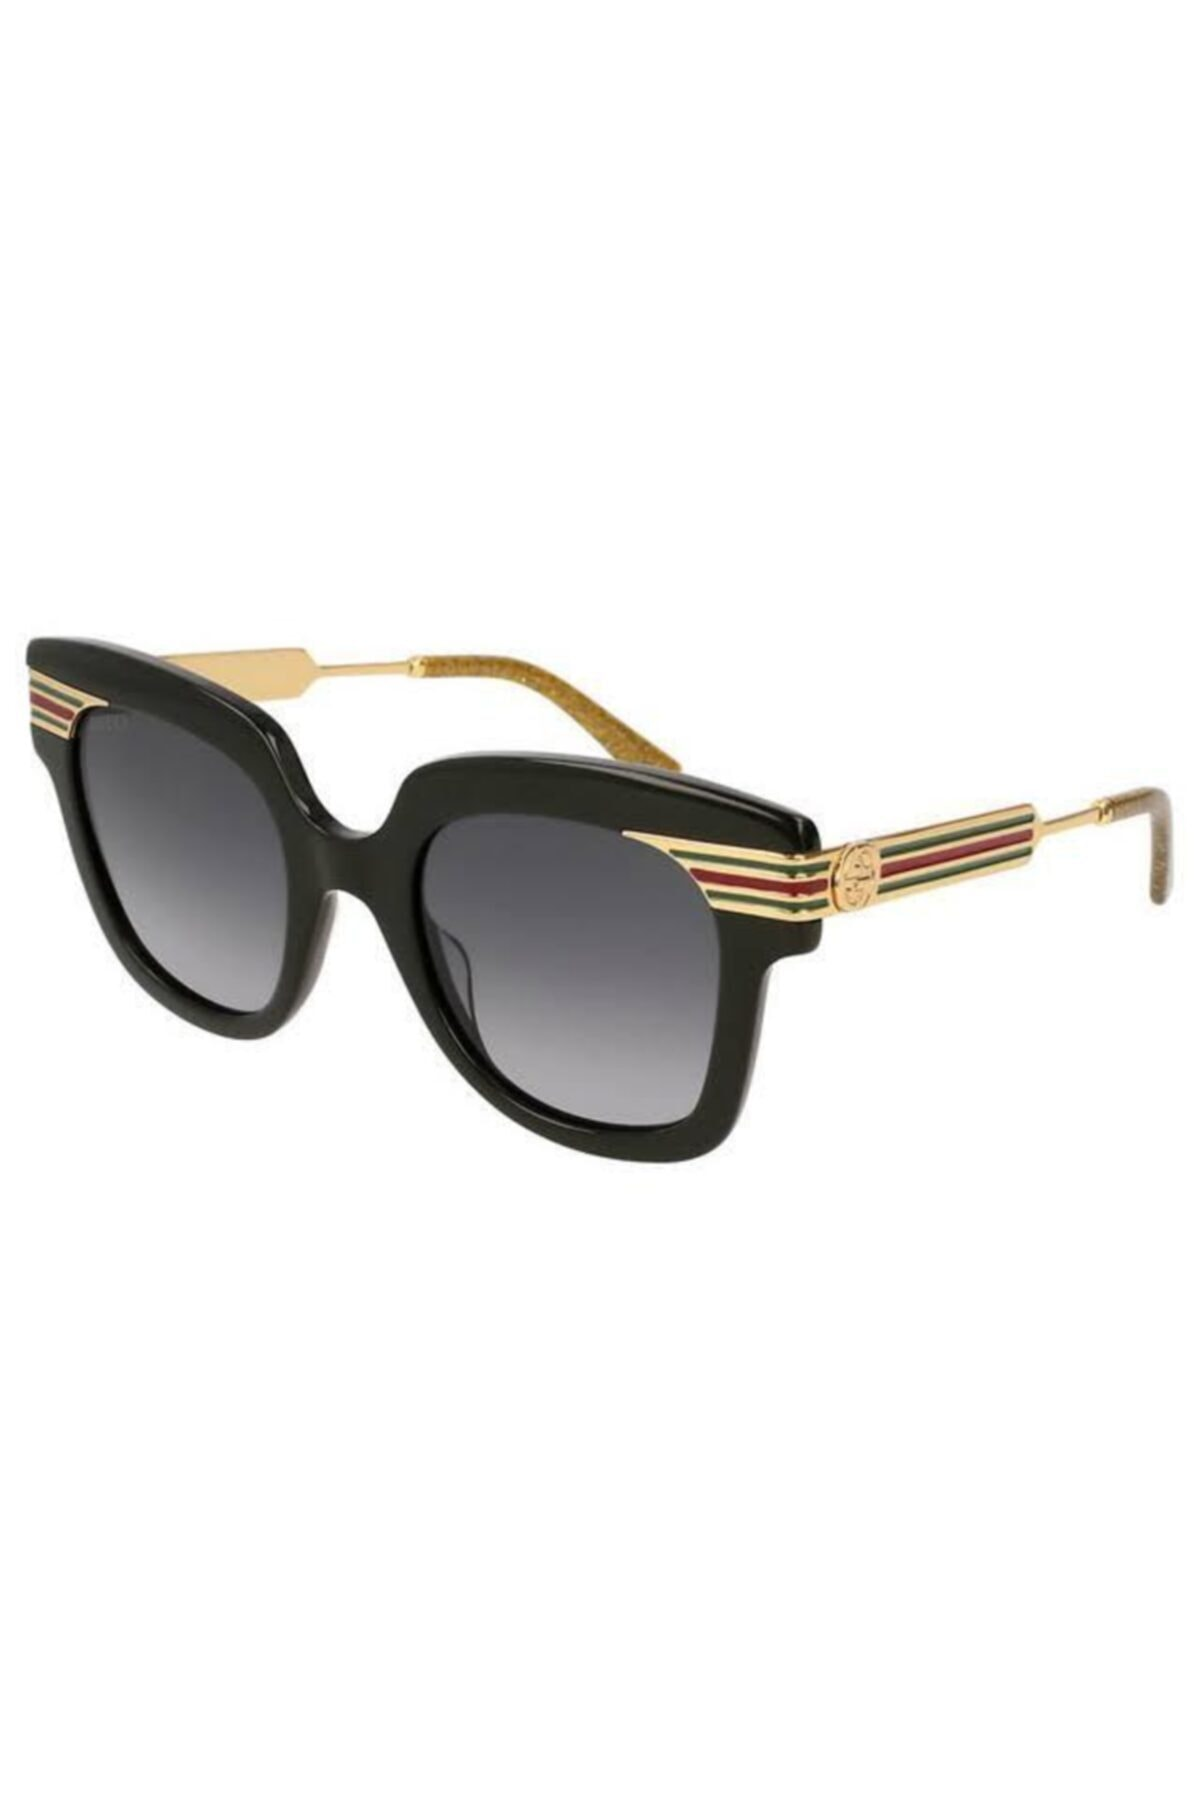 خرید مستقیم عینک آفتابی جدید برند گوچی رنگ مشکی کد ty55244479